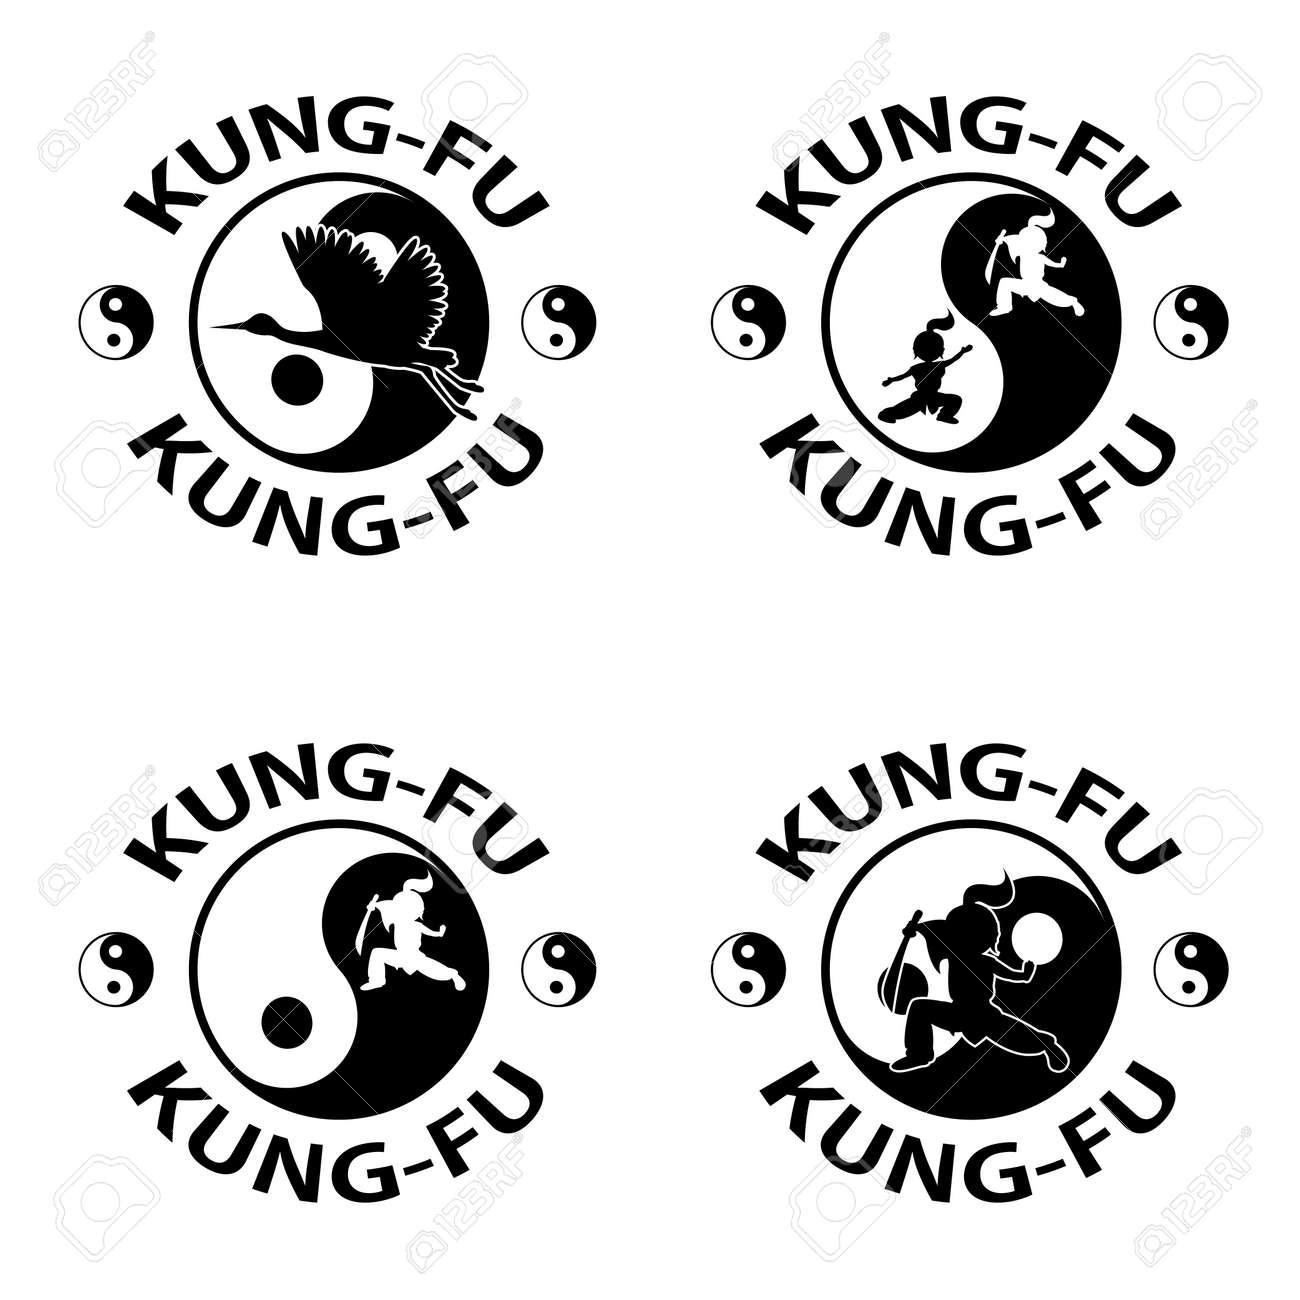 Kung fu logo,  isolated on white background Stock Vector - 15481836